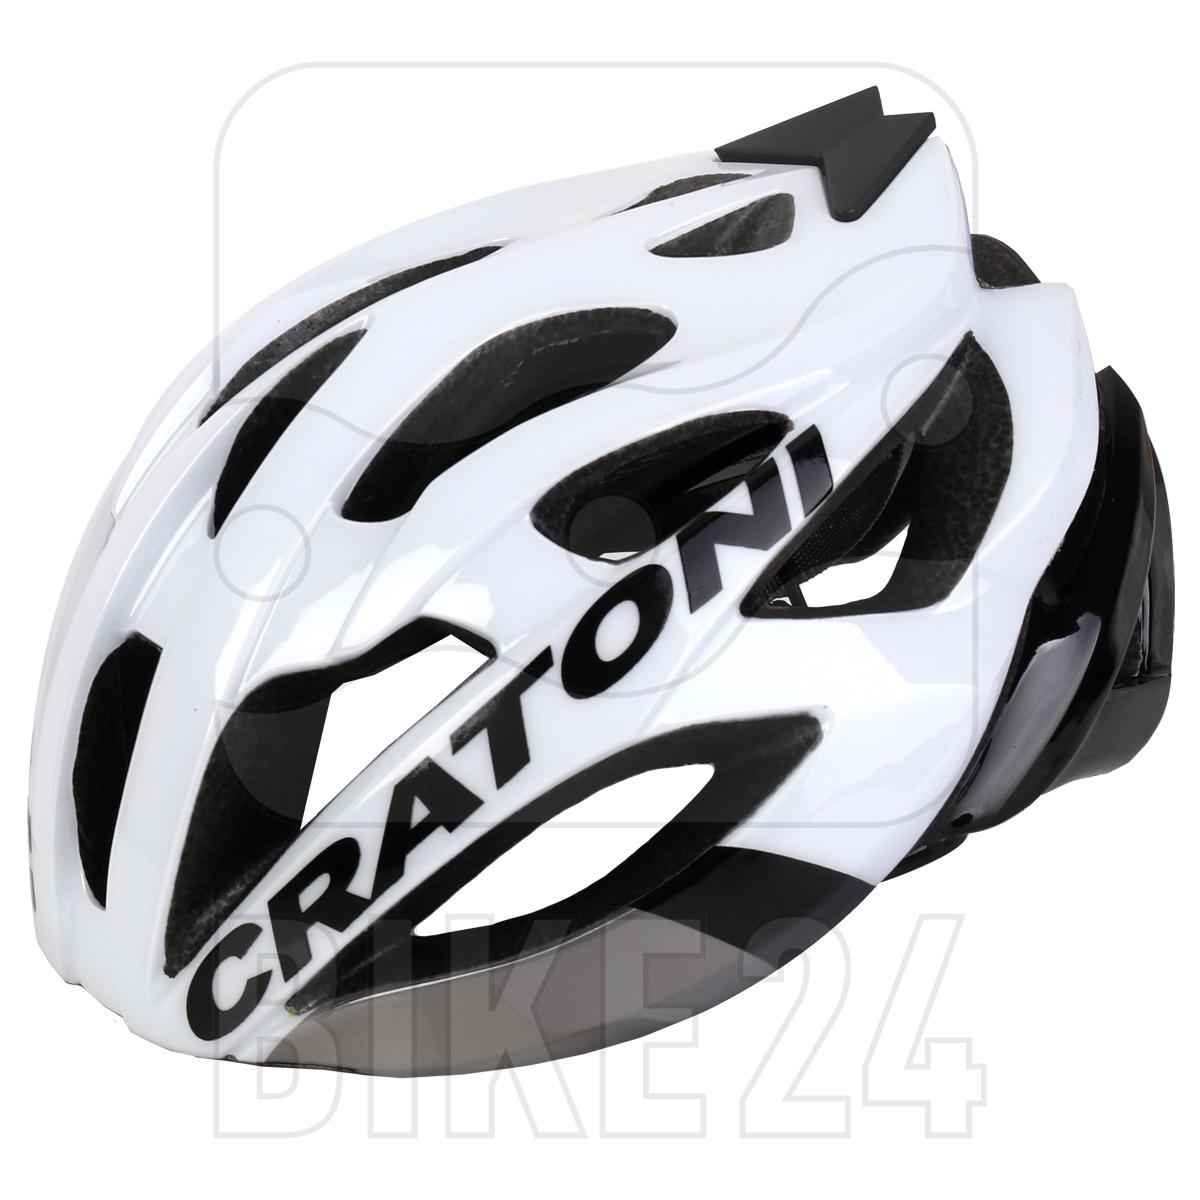 CRATONI C-Bolt Helmet - white glossy